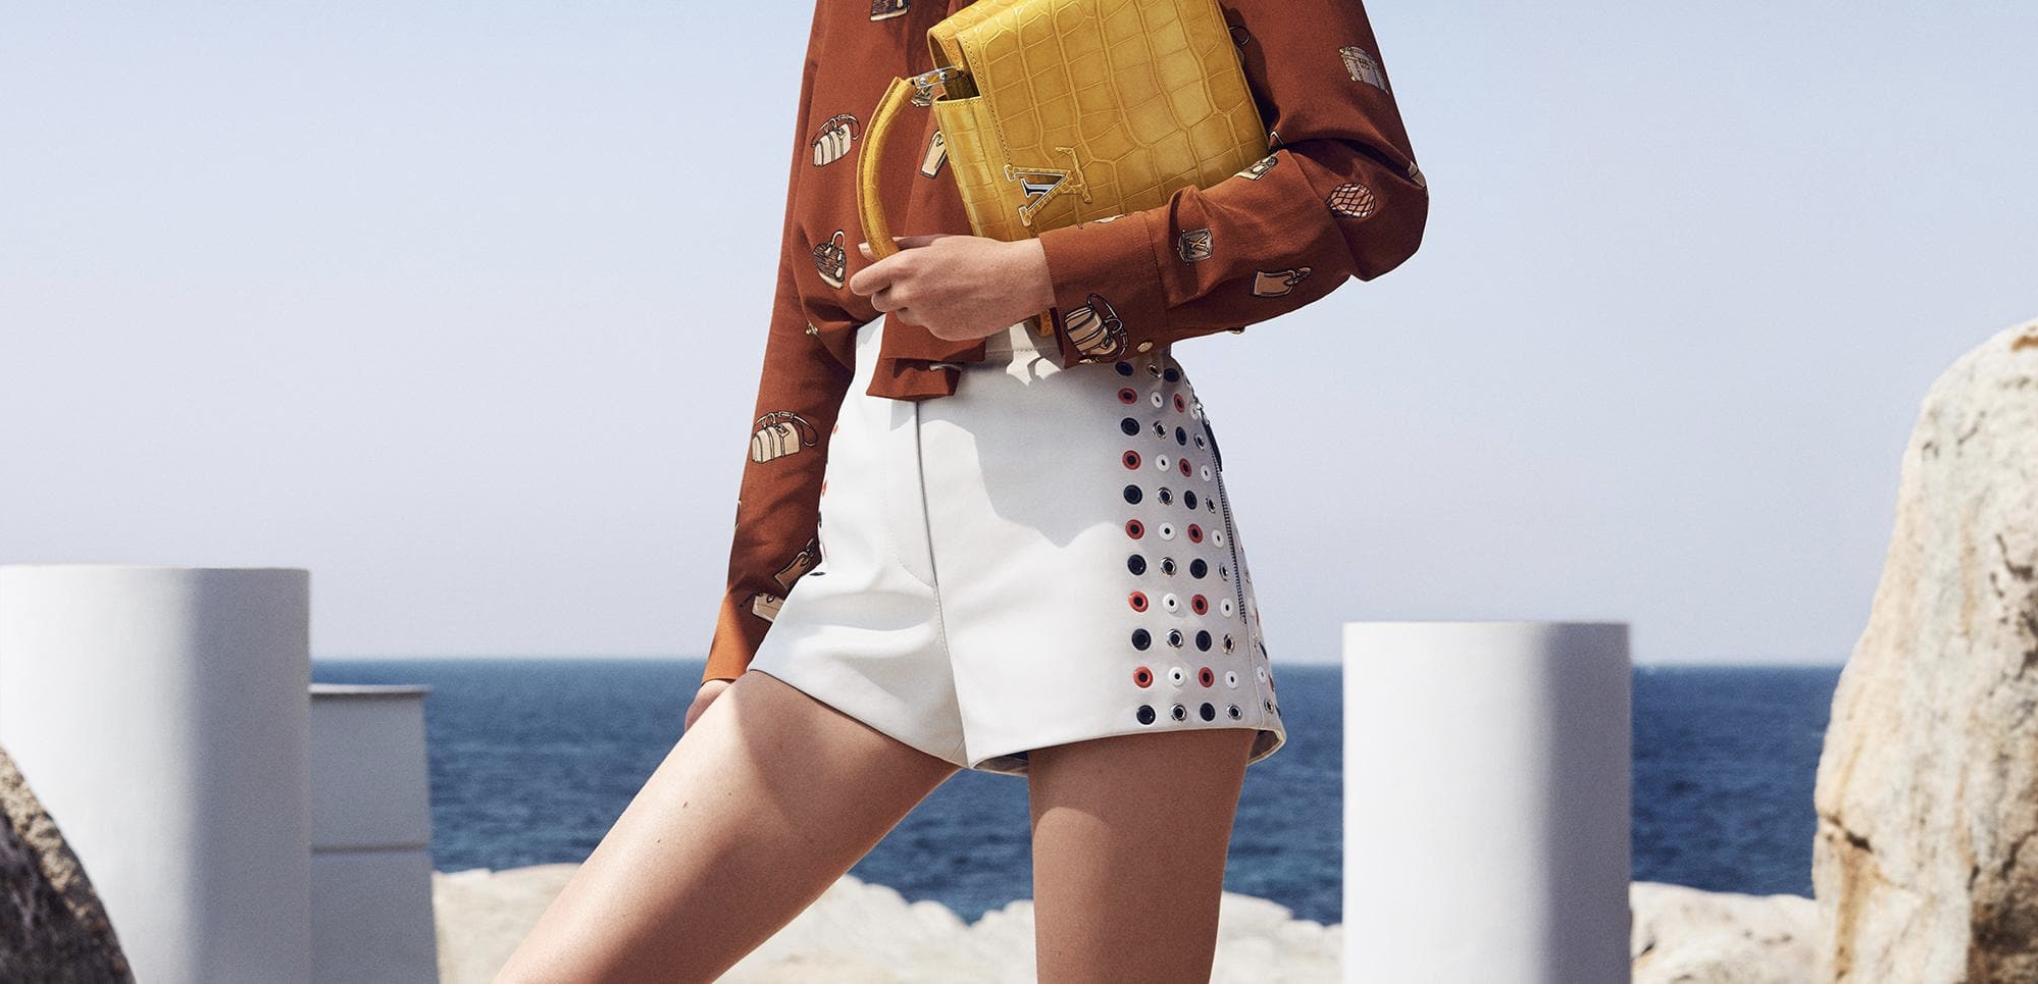 Louis Vuitton Women's 2019 Cruise Campaign